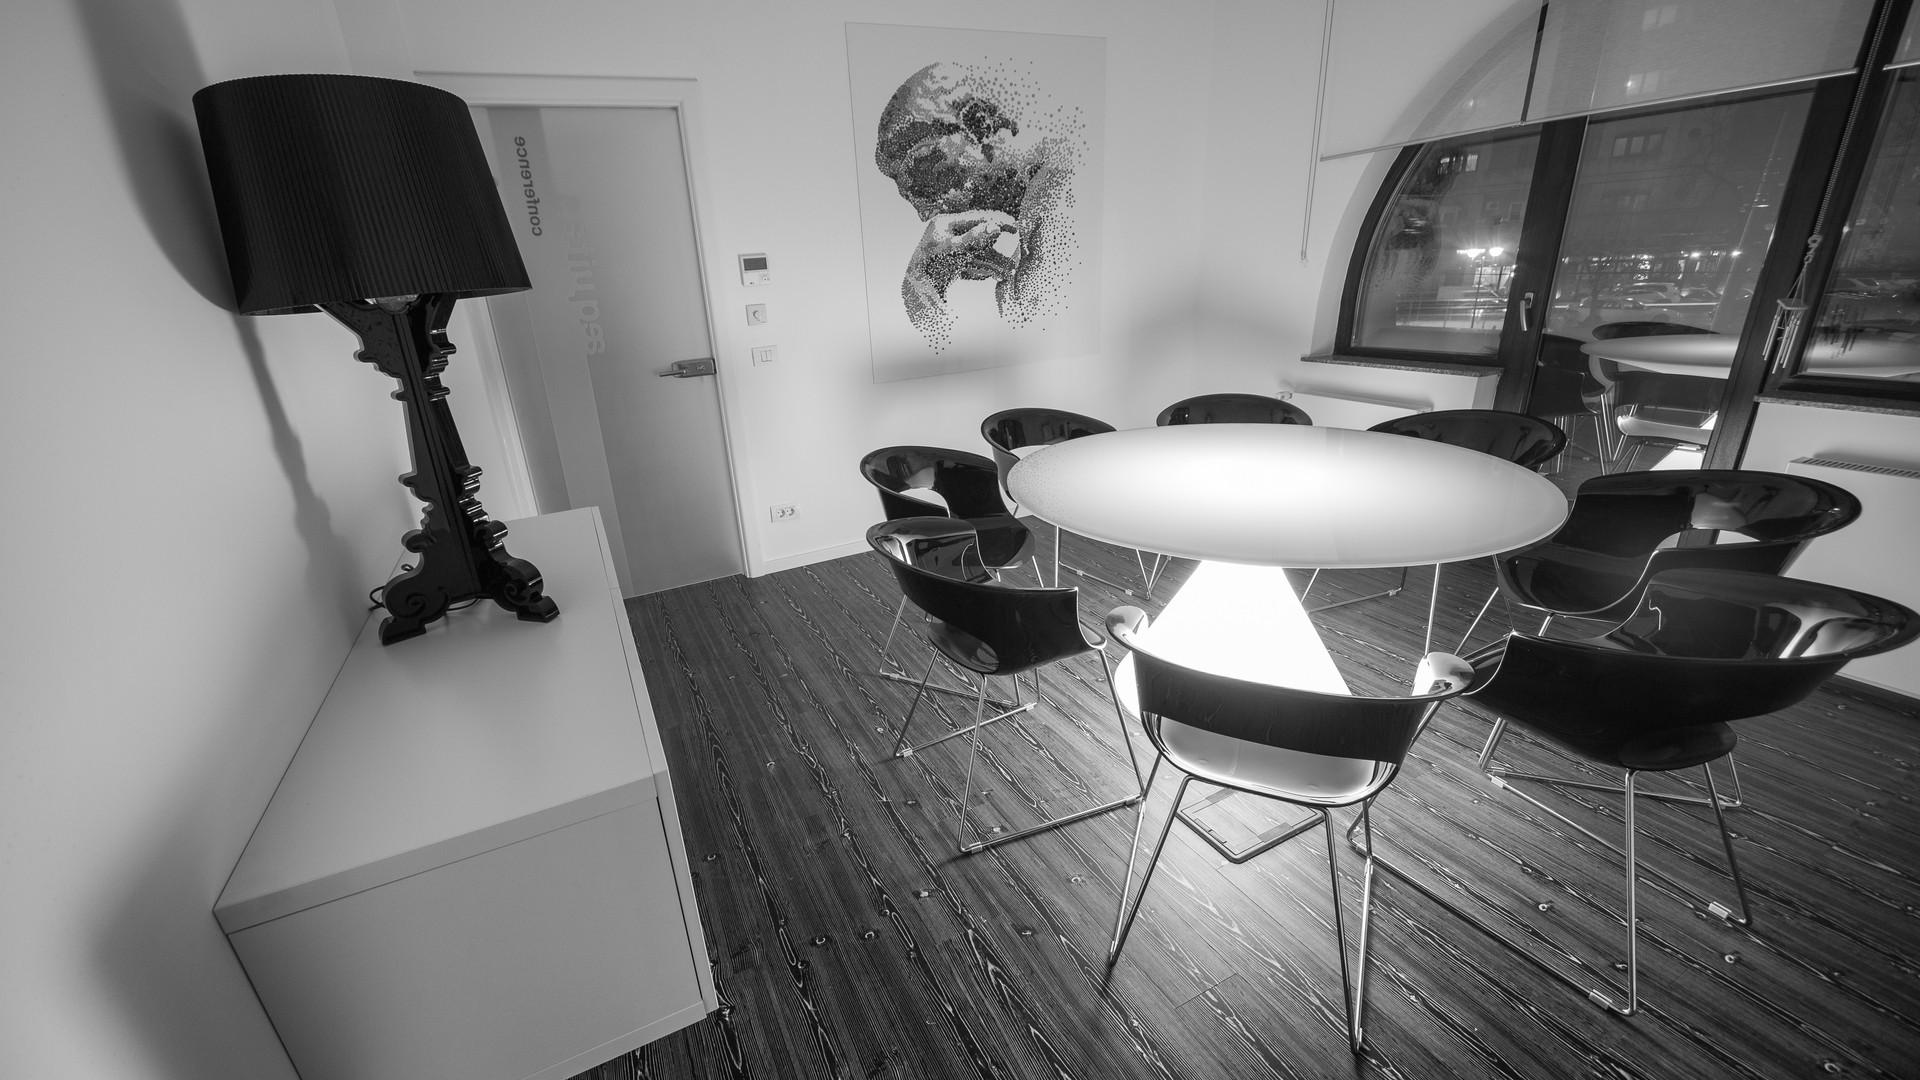 aequitas_arhitectura_room.jpg